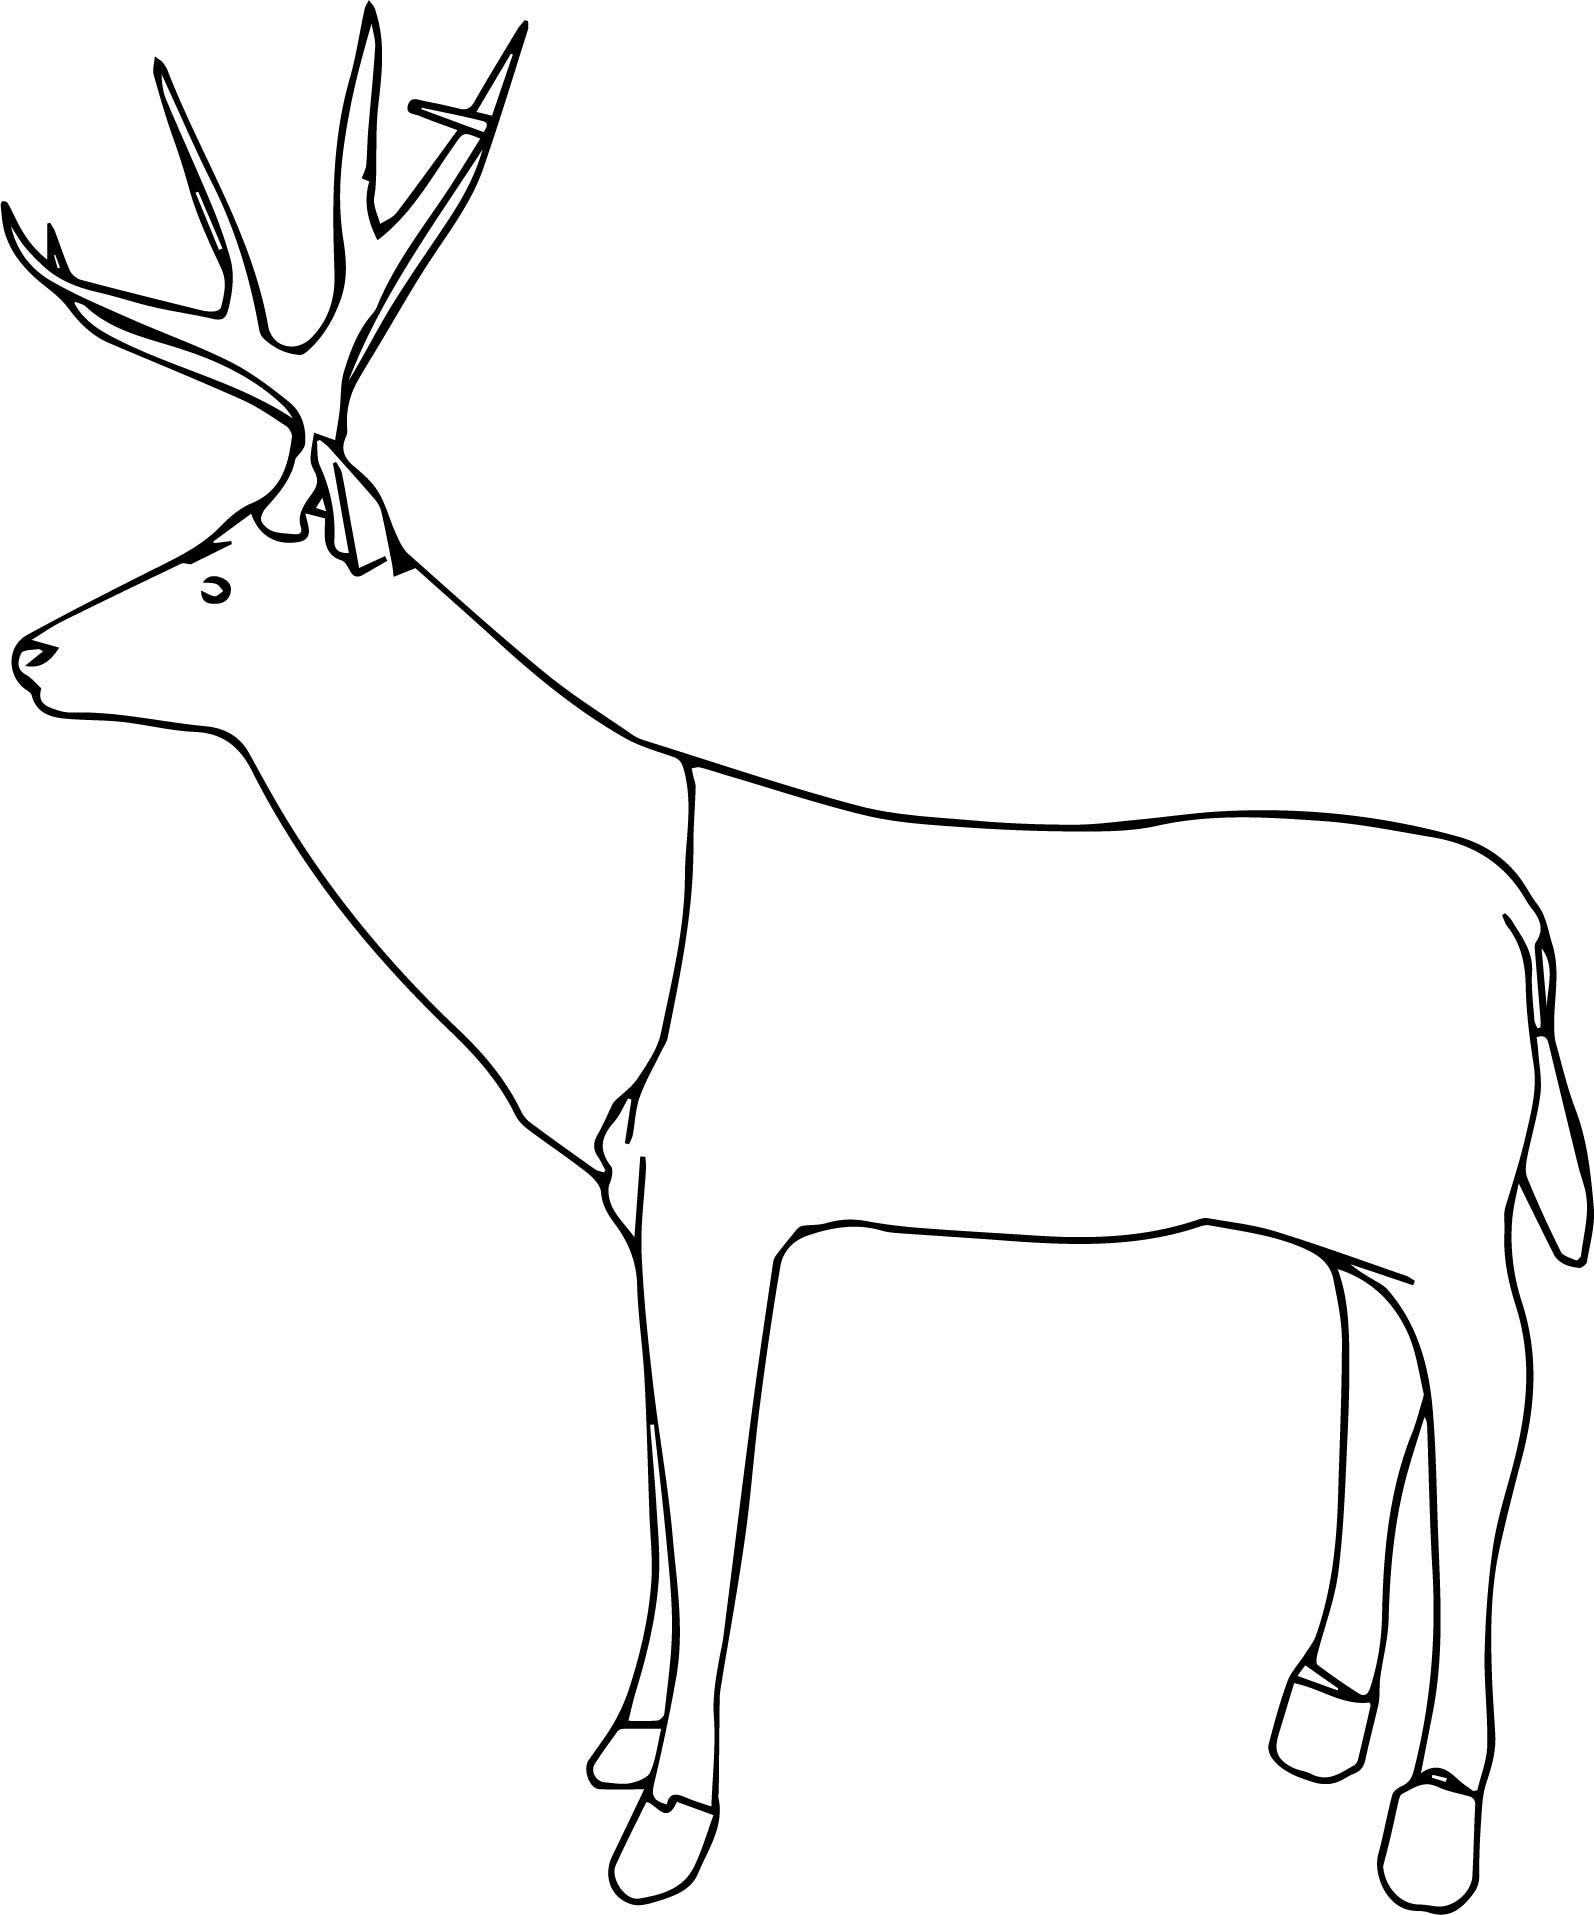 Deer Side Coloring Pages